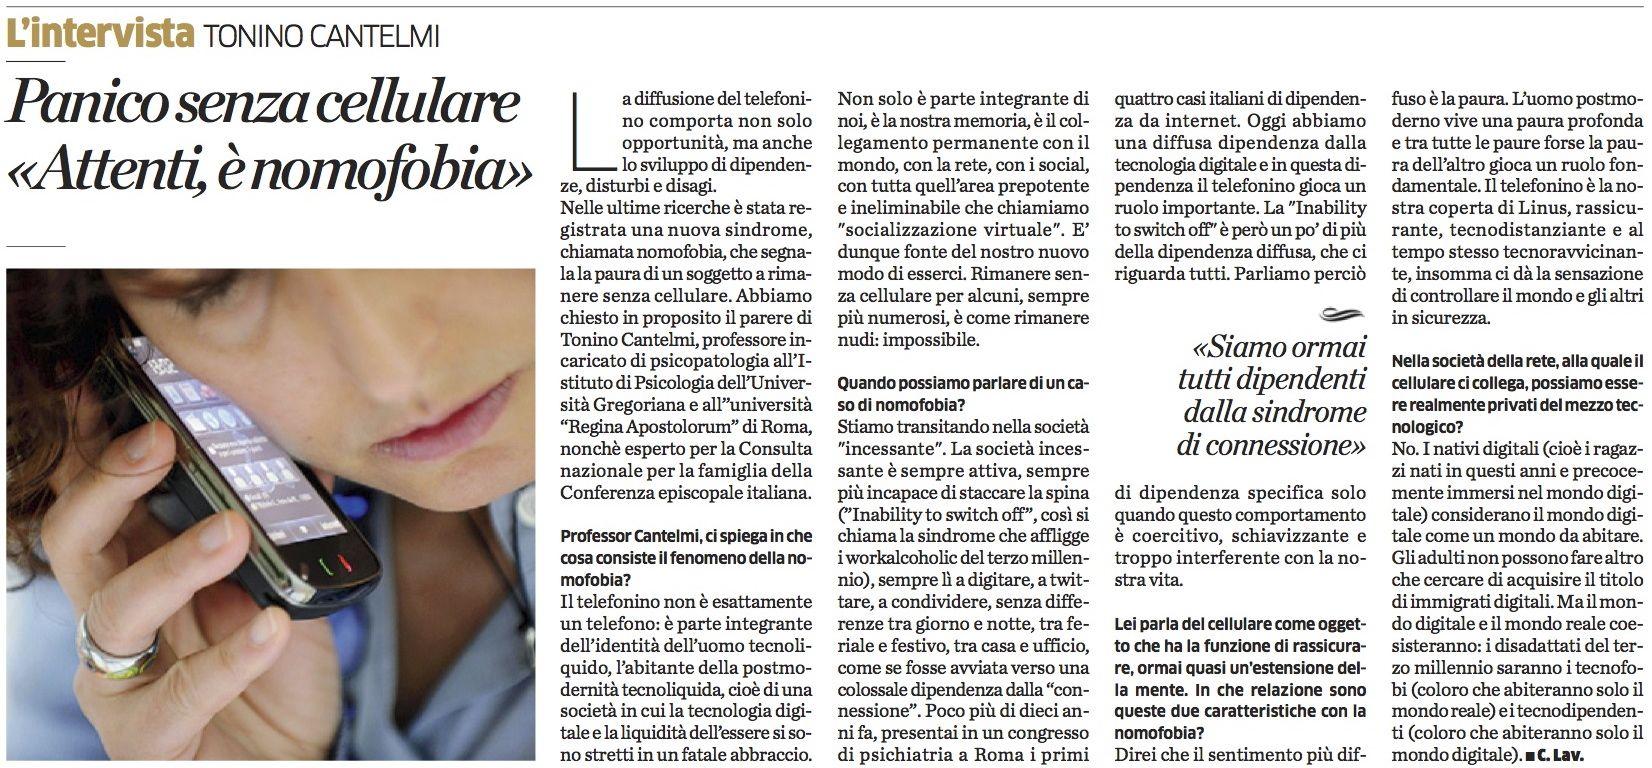 Tonino Cantelmi intervista cellulari